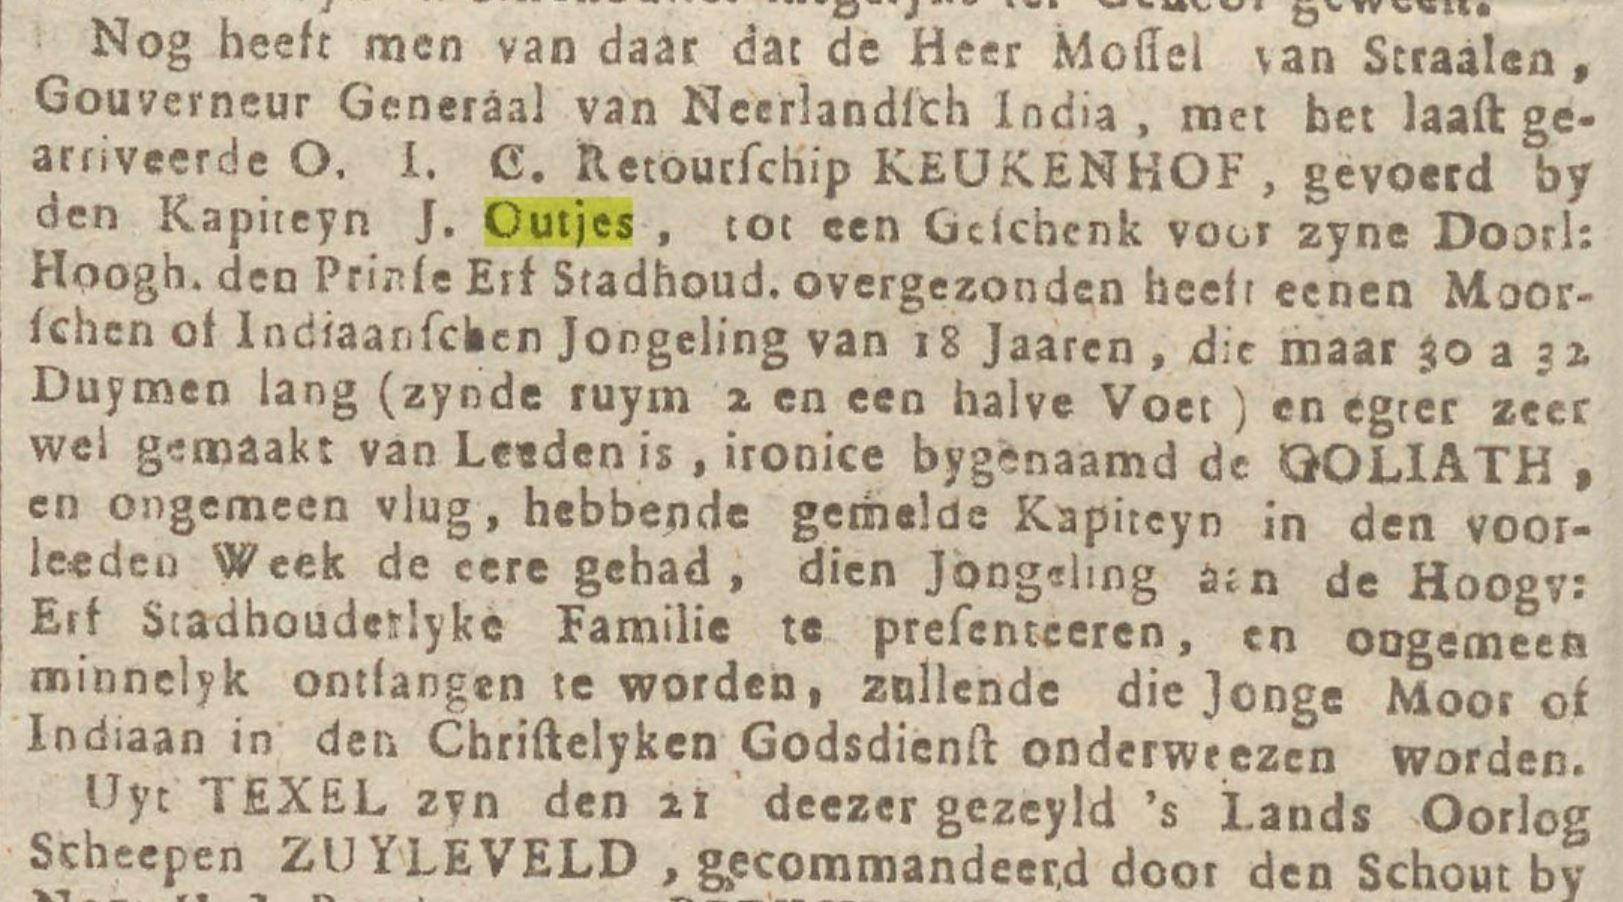 27 6 1755 Opregte Groninger courant Keukenhof Outjes Dwerg n